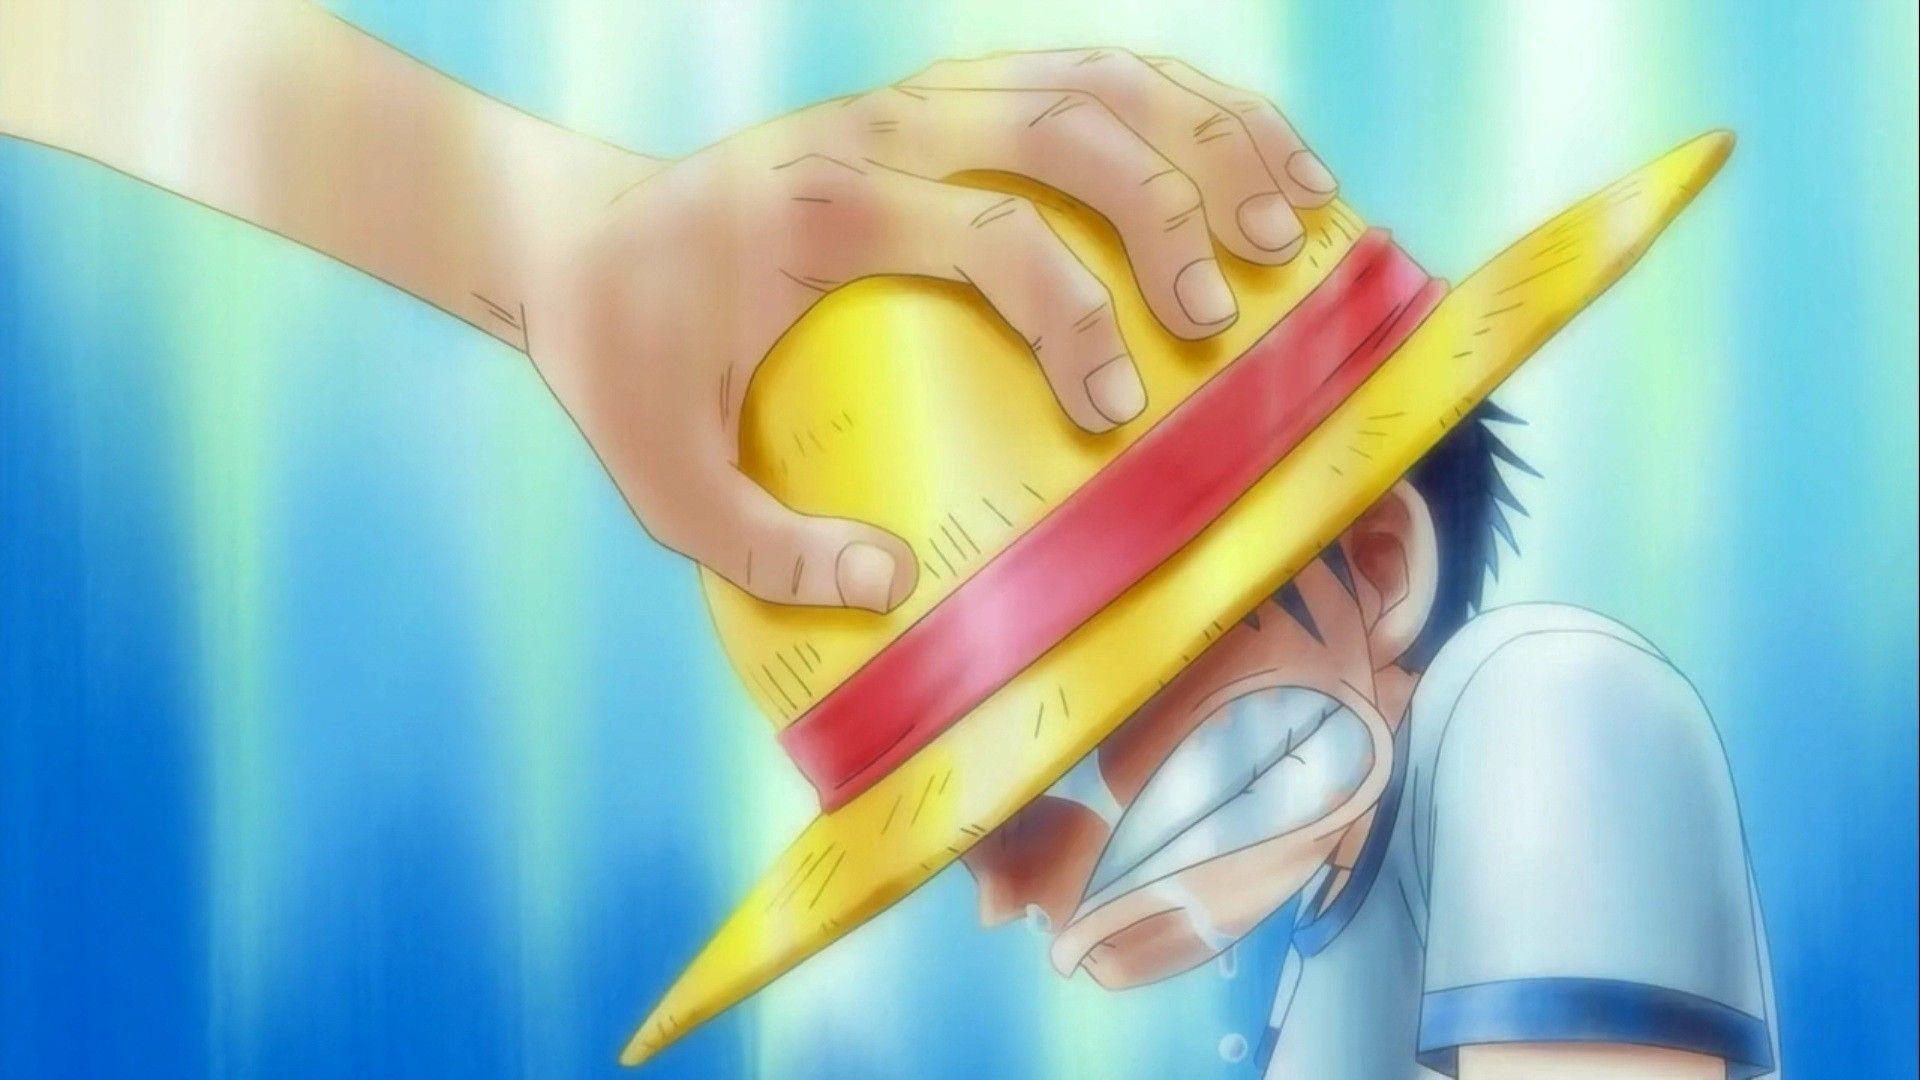 One Piece Manga Actu Manga Shueisha One Piece Magazine Glénat Weekly Shonen Jump